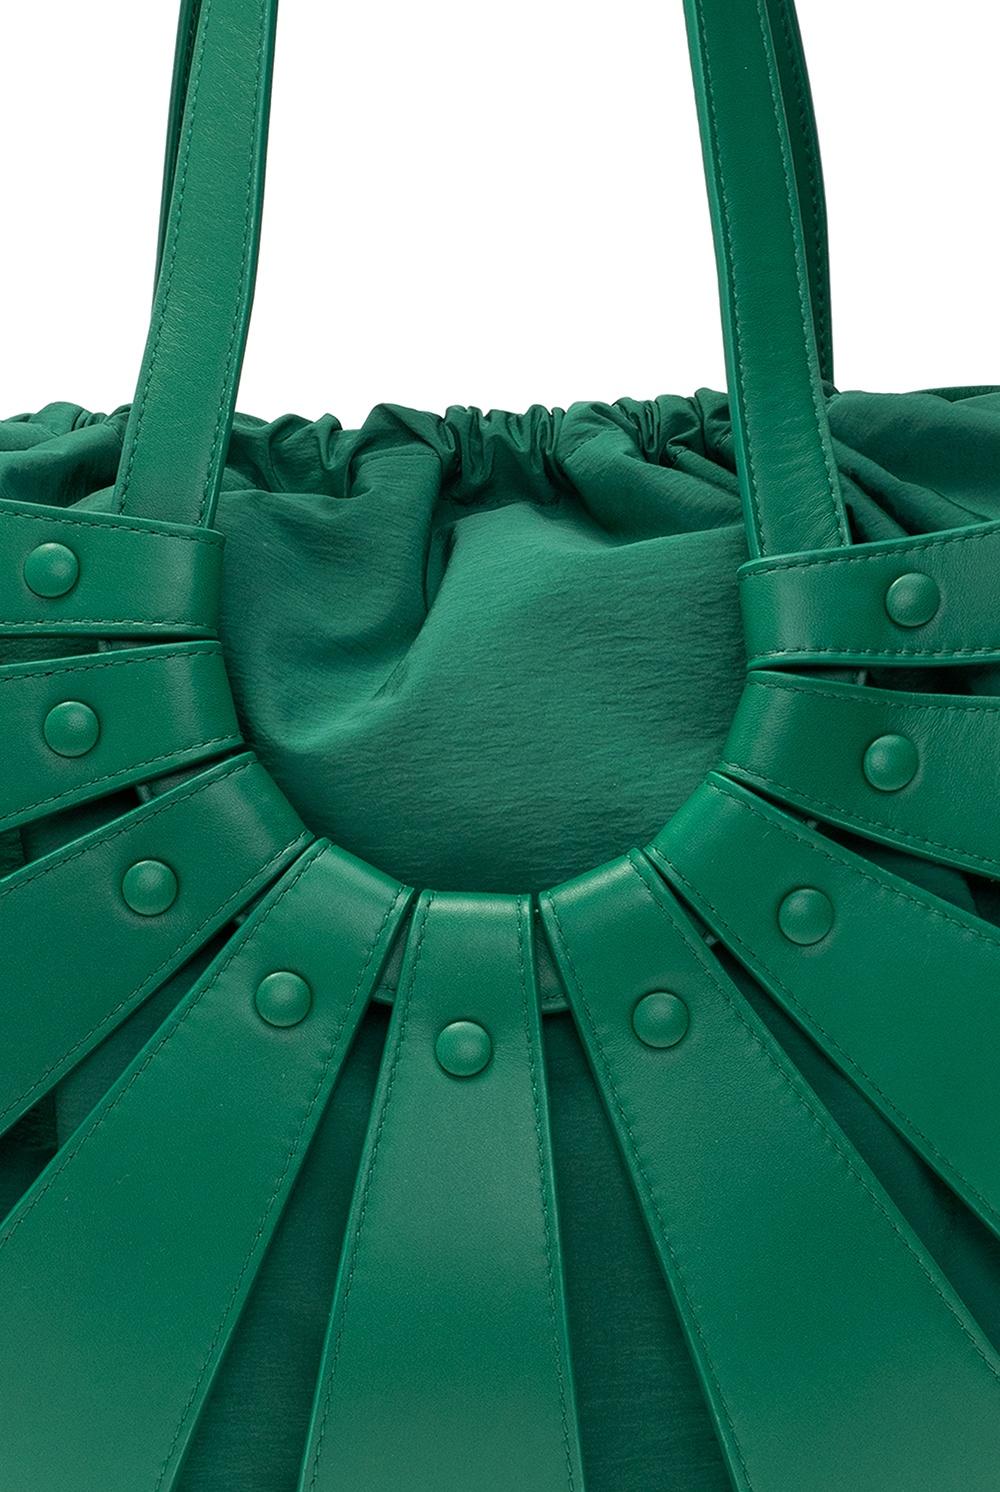 Bottega Veneta 'The Shell' hand bag